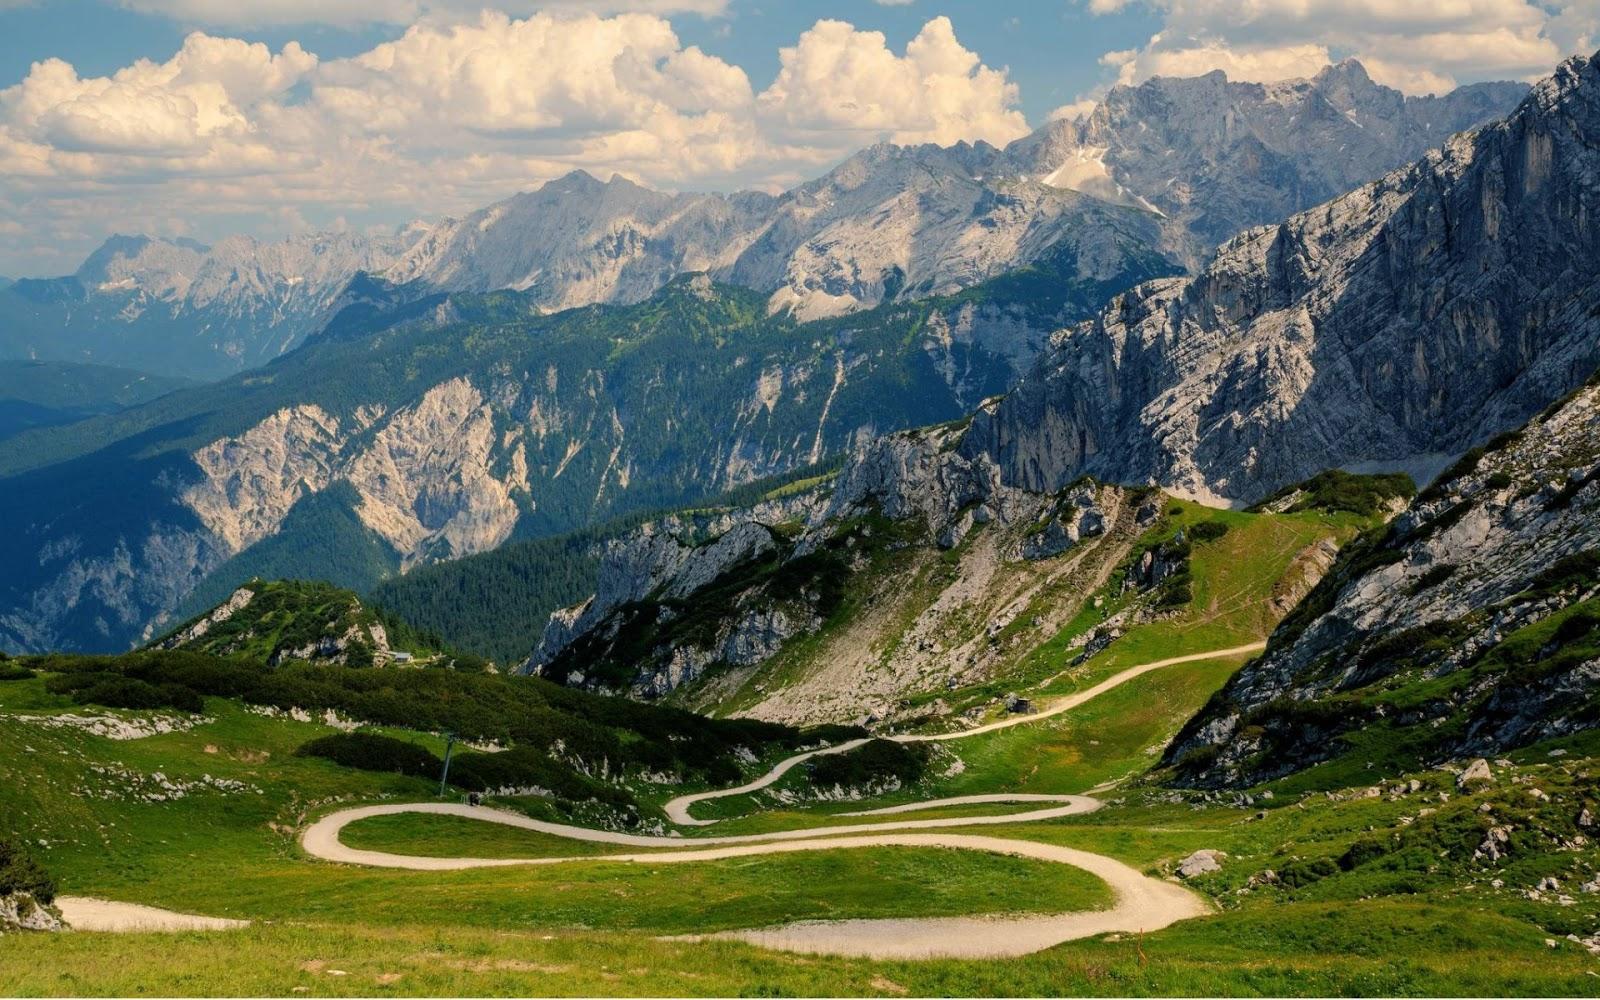 Pegunungan Alpen, Jejeran Gunung Tertinggi dan Terluas Yang Berada di Eropa